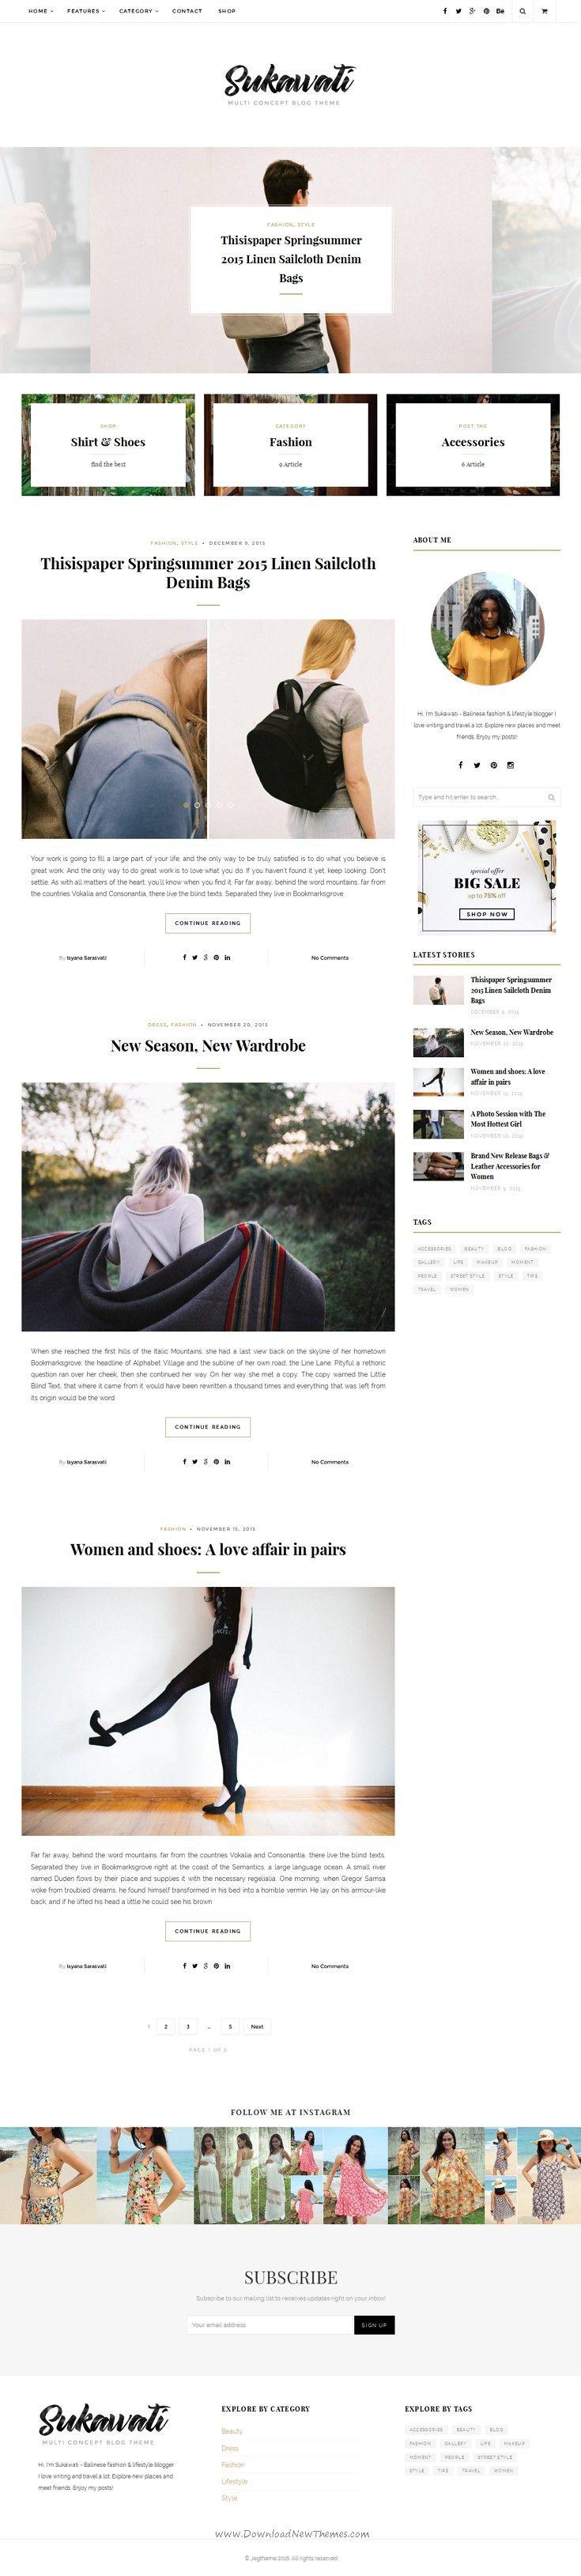 763 best Blog Layouts & WordPress Themes images on Pinterest ...